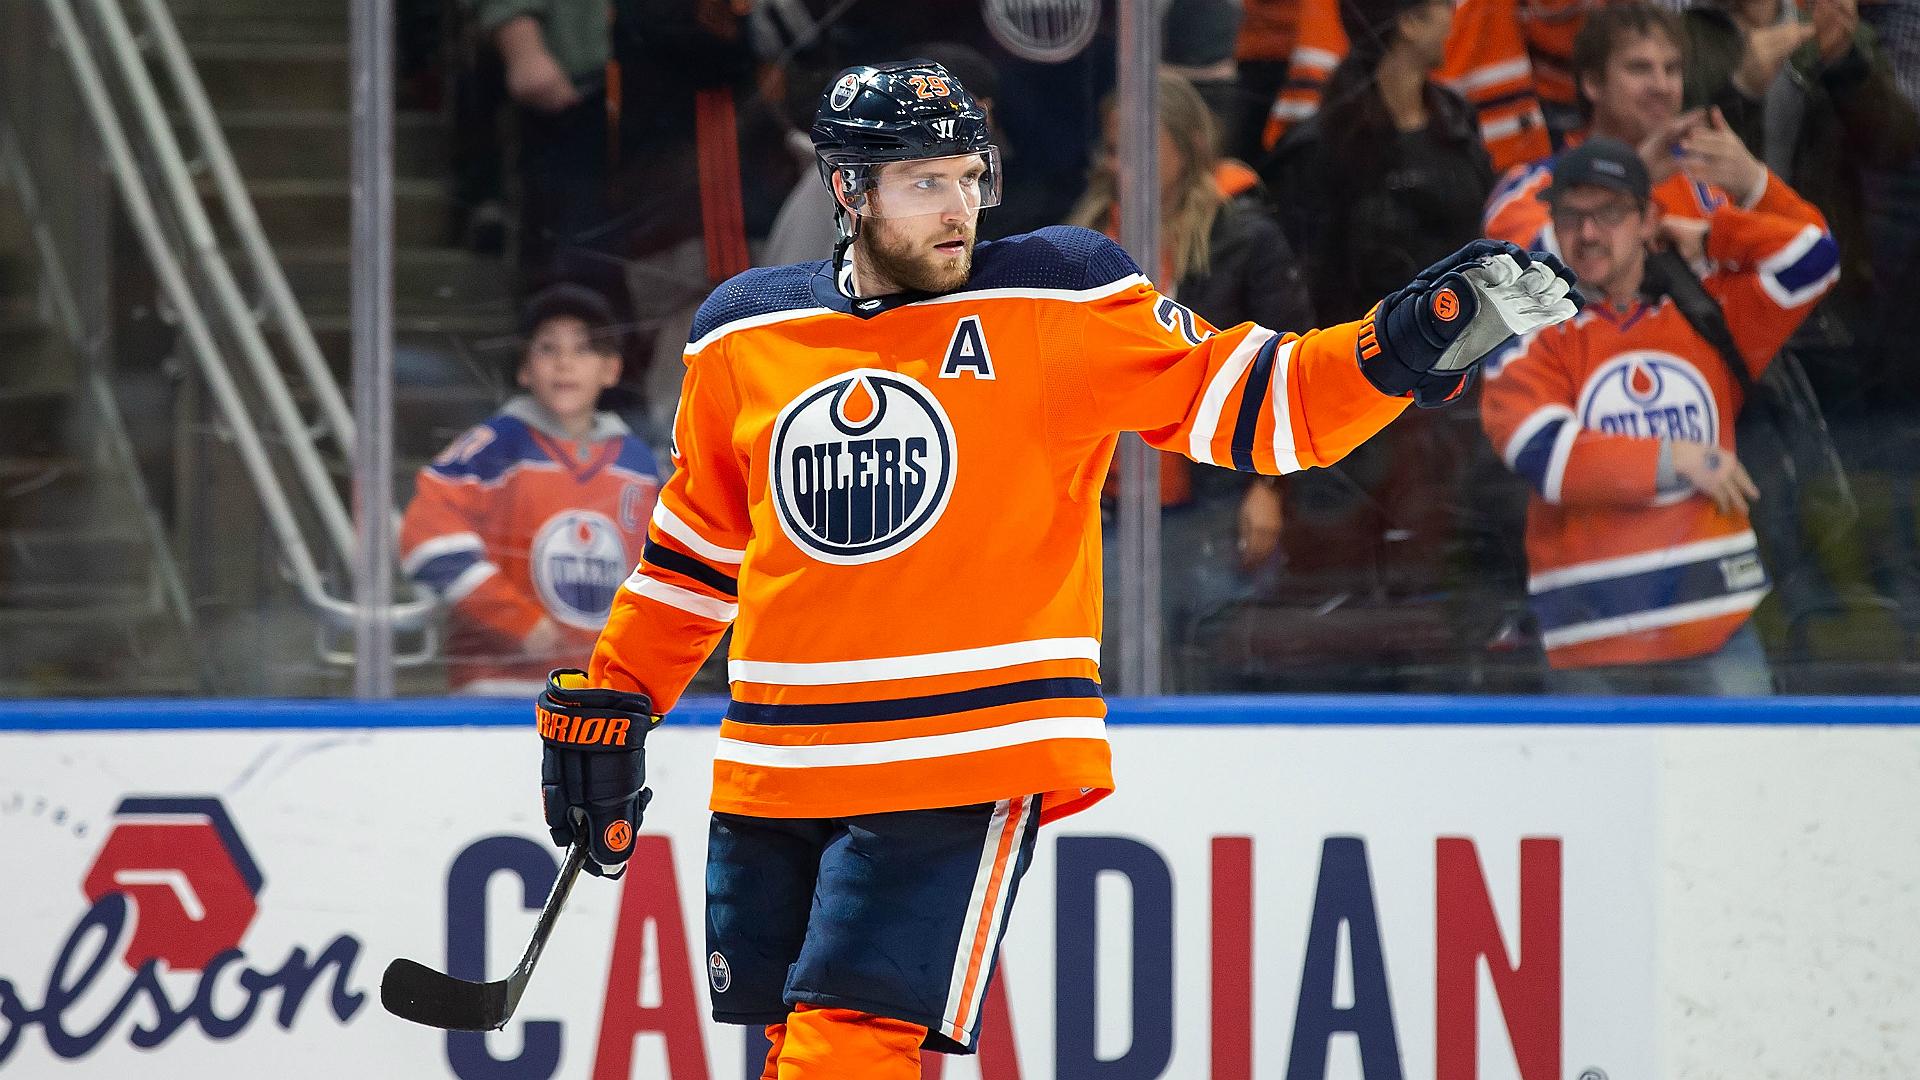 Art Ross Trophy 2020: Leaders in 2019-20 NHL points-scoring race, previous winners, history